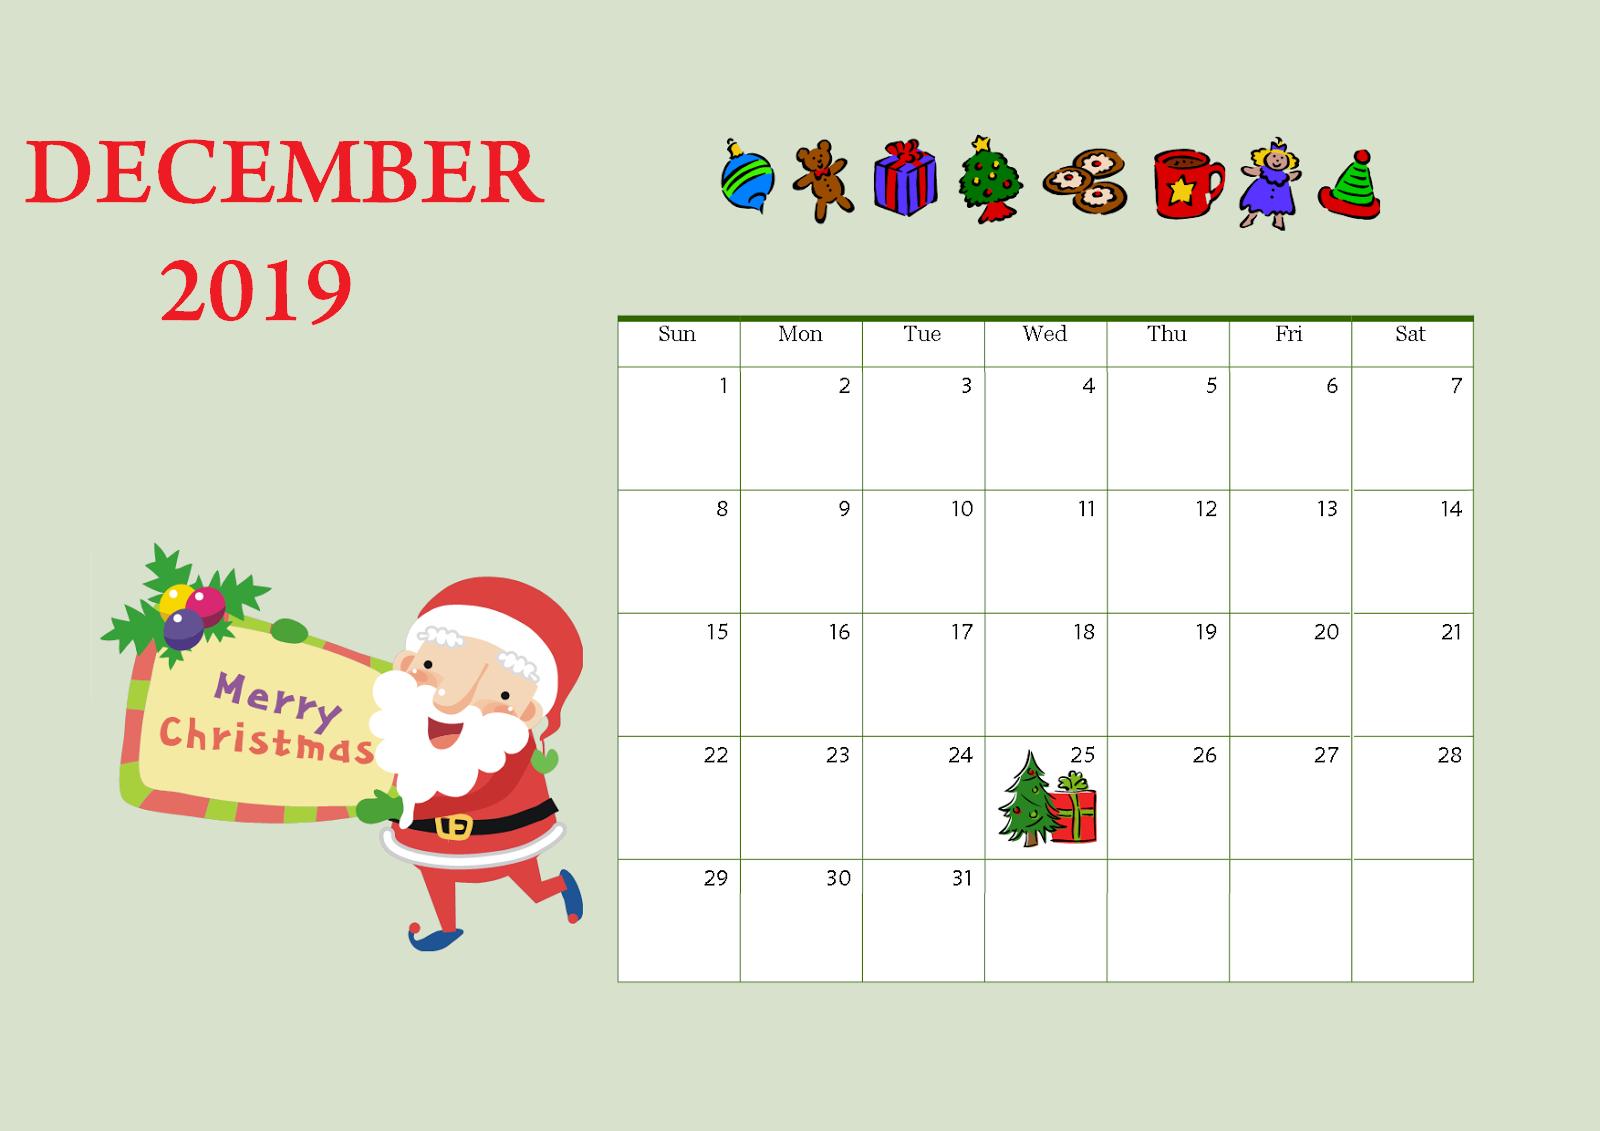 December 2019 Printable Wall Calendar